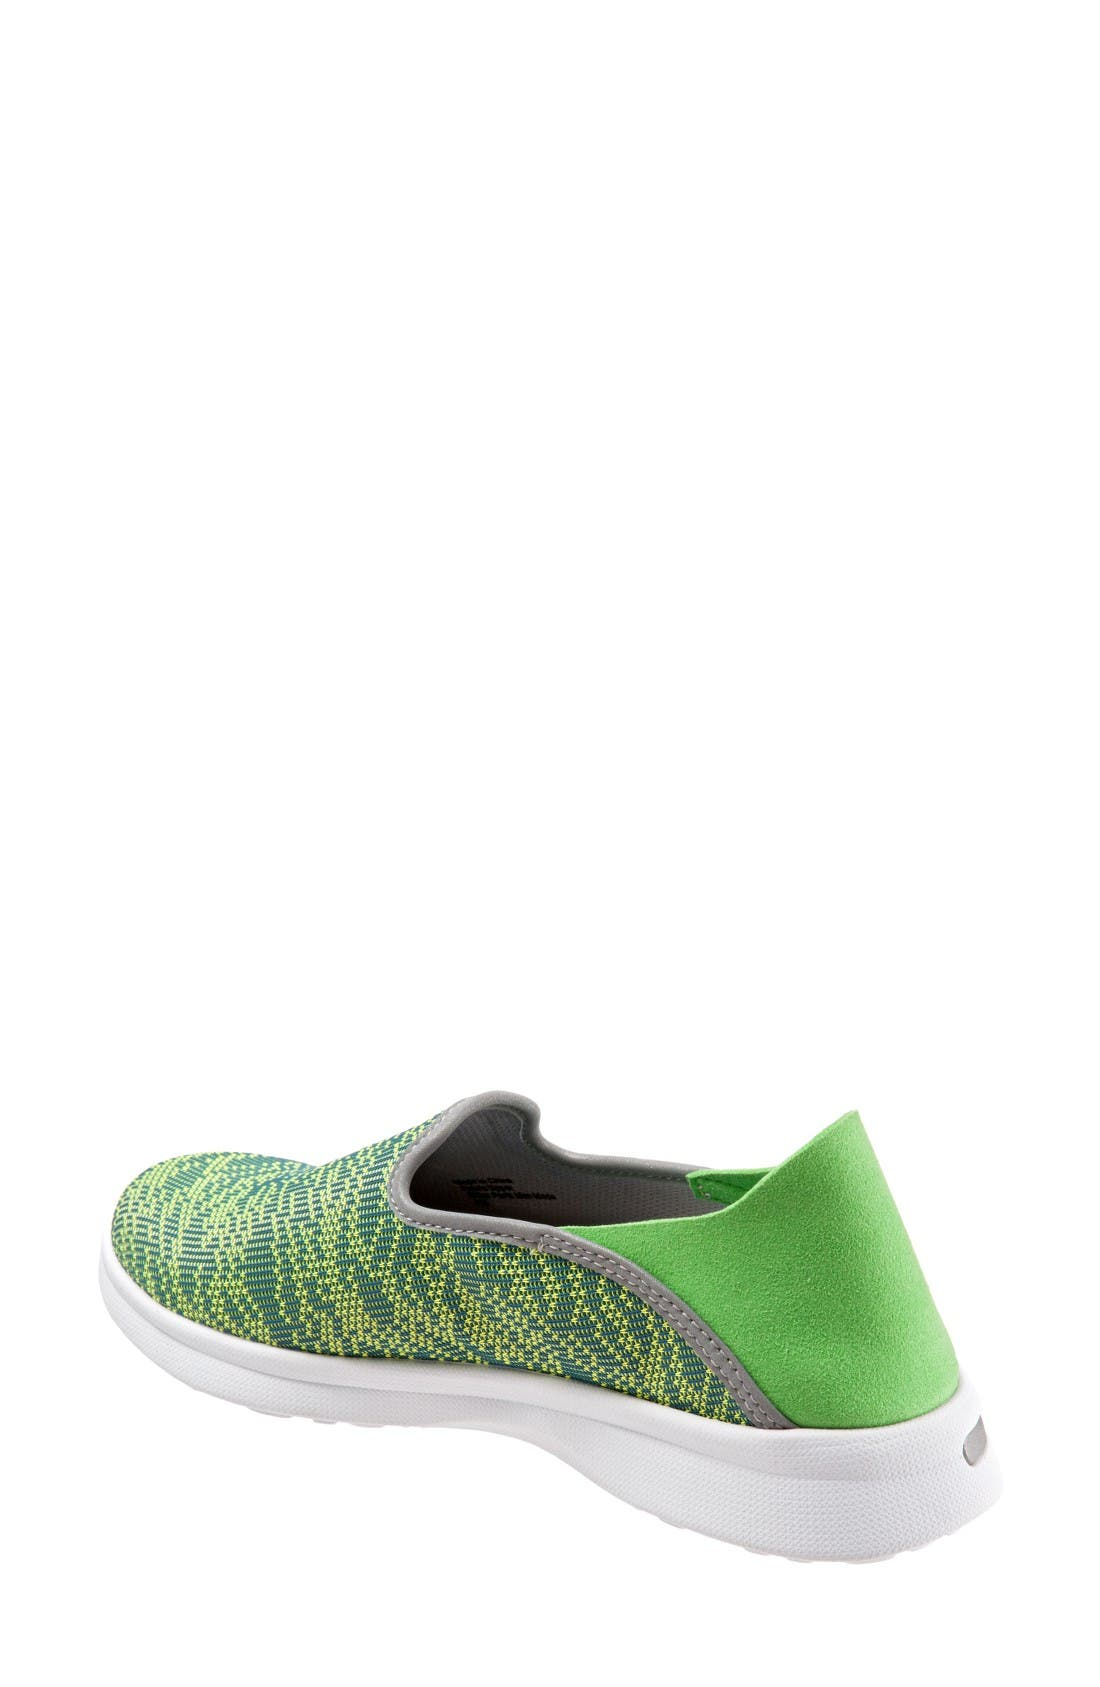 Convertible Slip-On Sneaker,                             Alternate thumbnail 2, color,                             Green Fabric